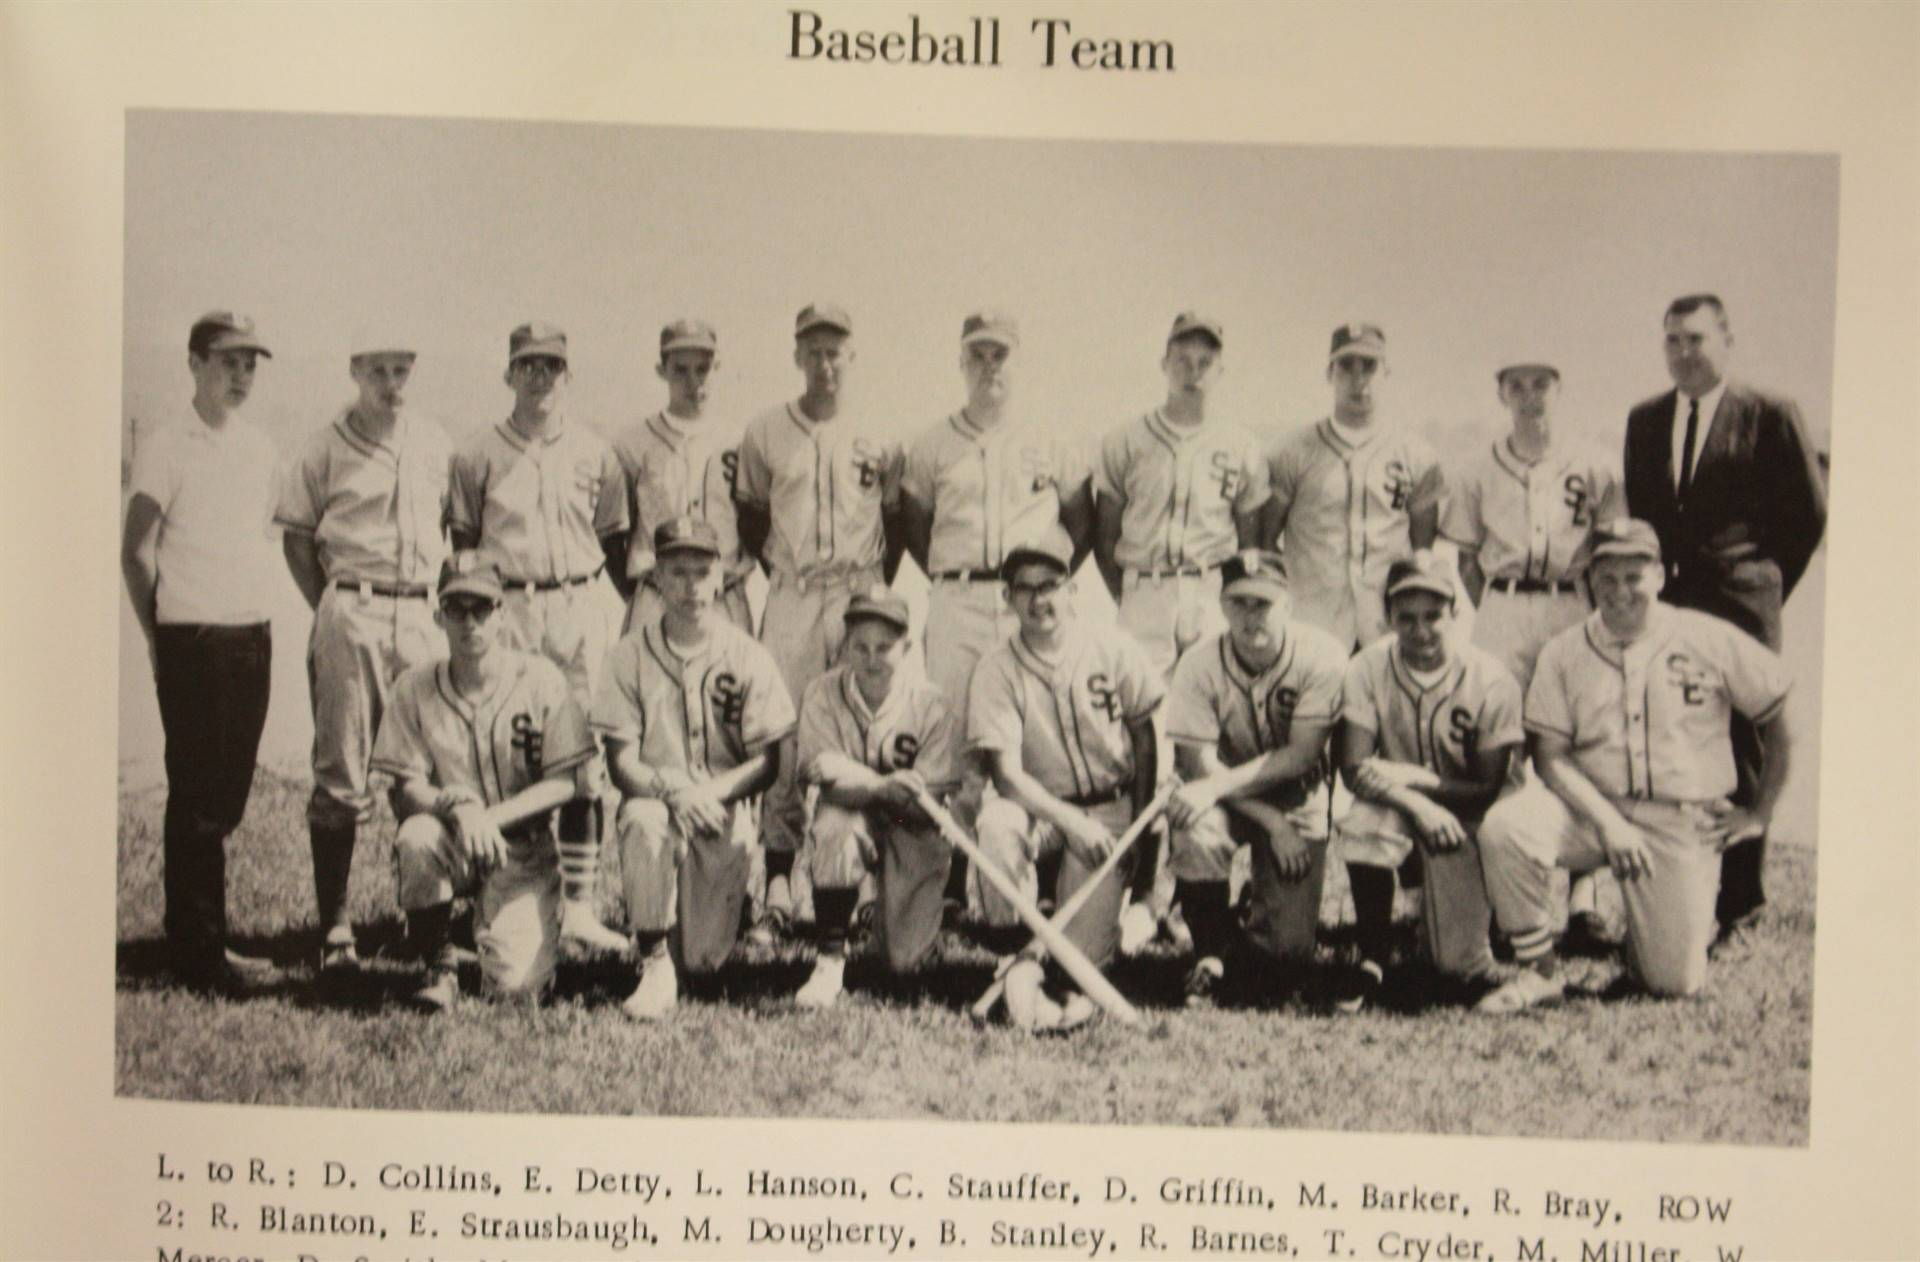 1965 baseball